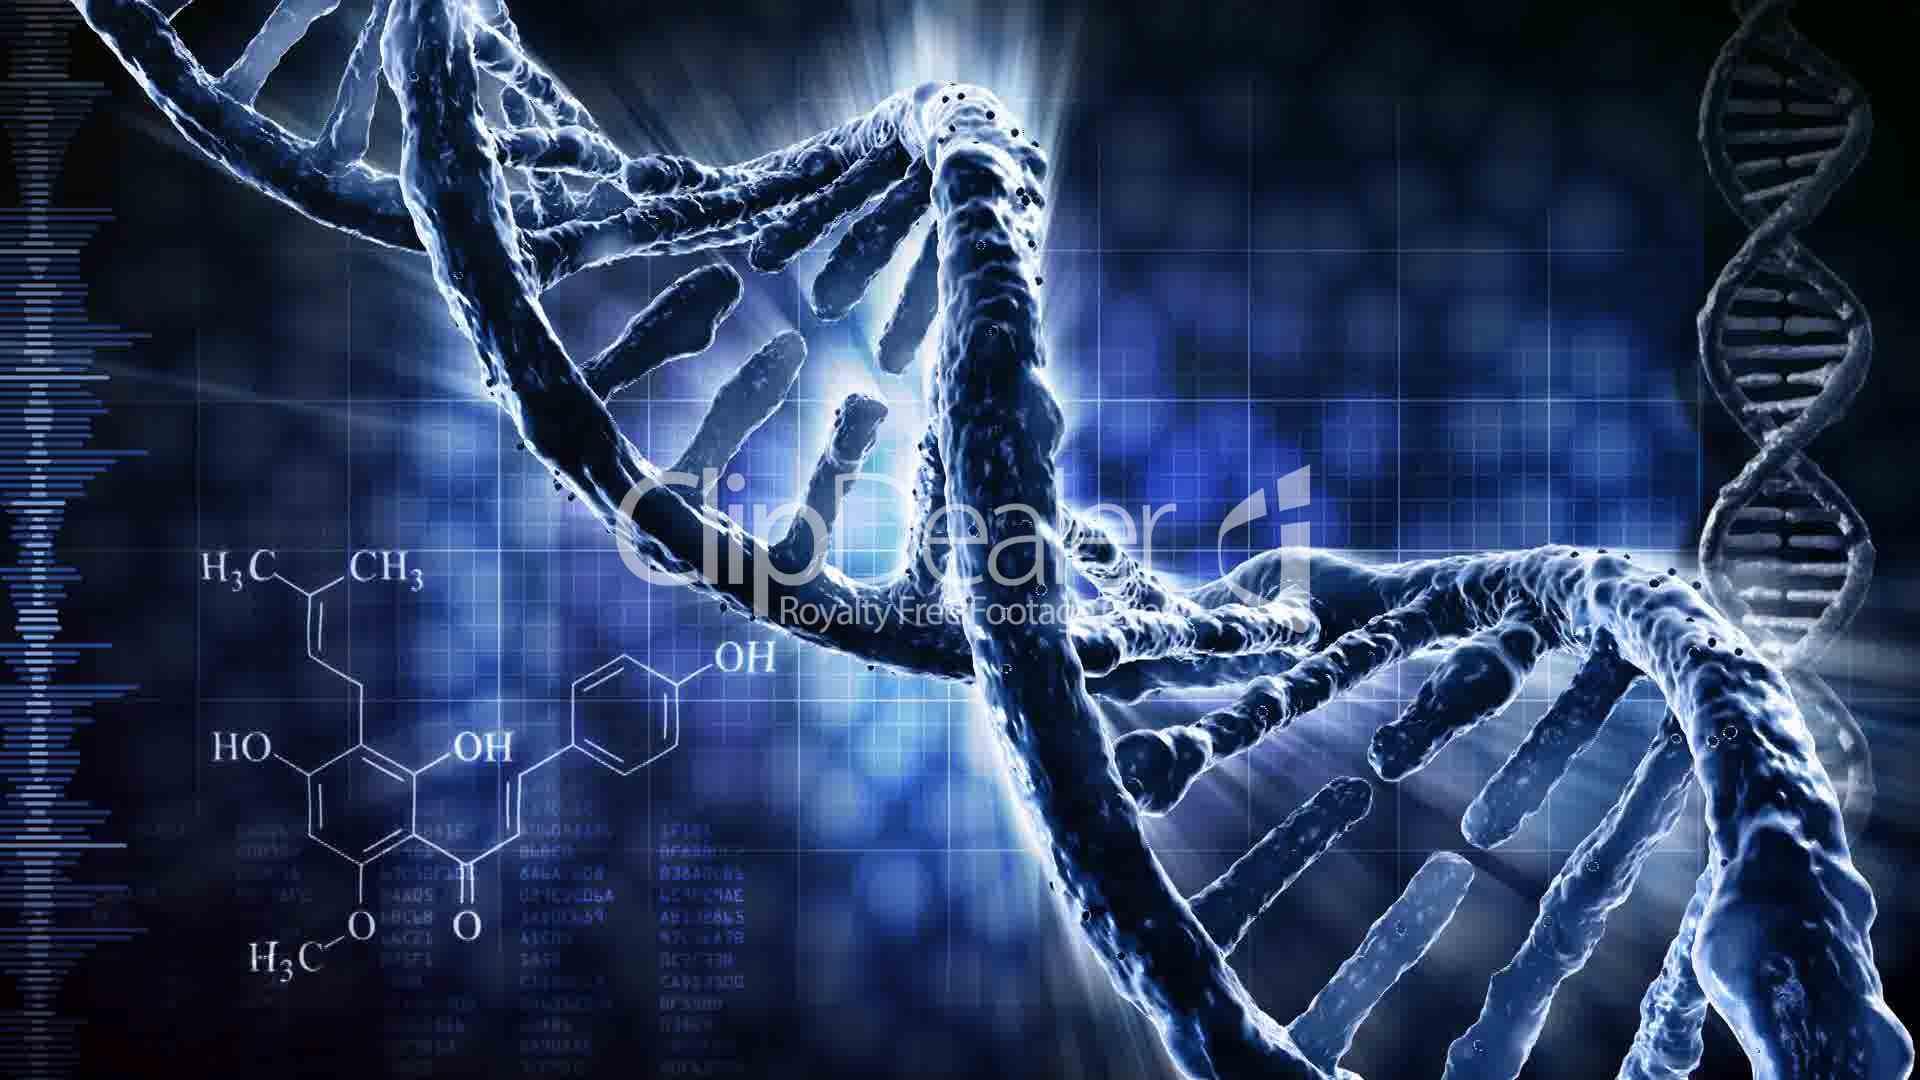 scientific linux wallpaper